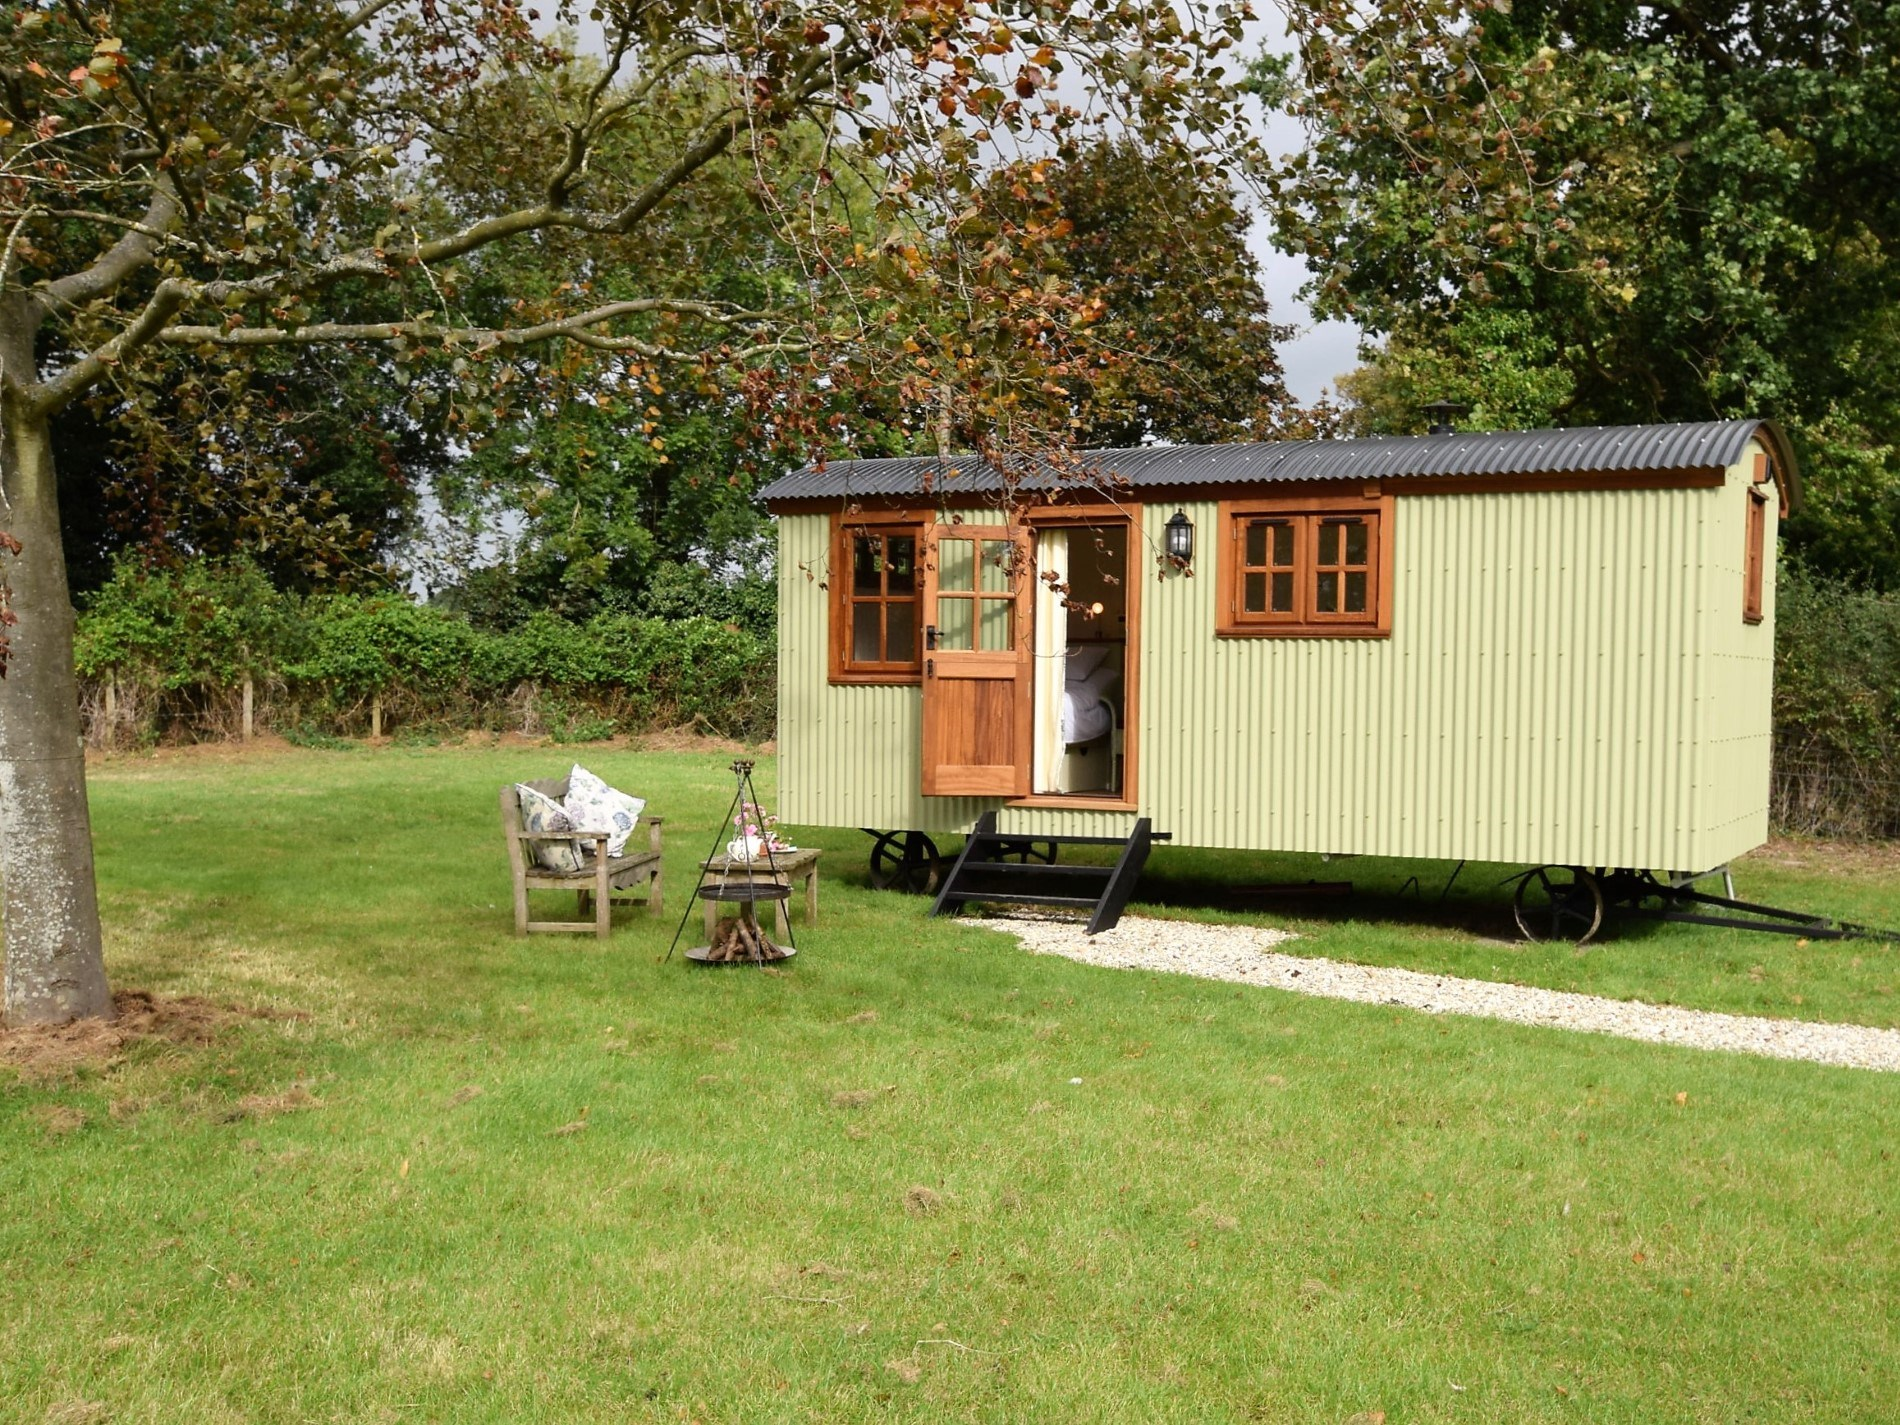 Ferienhaus in Appledore-Kent